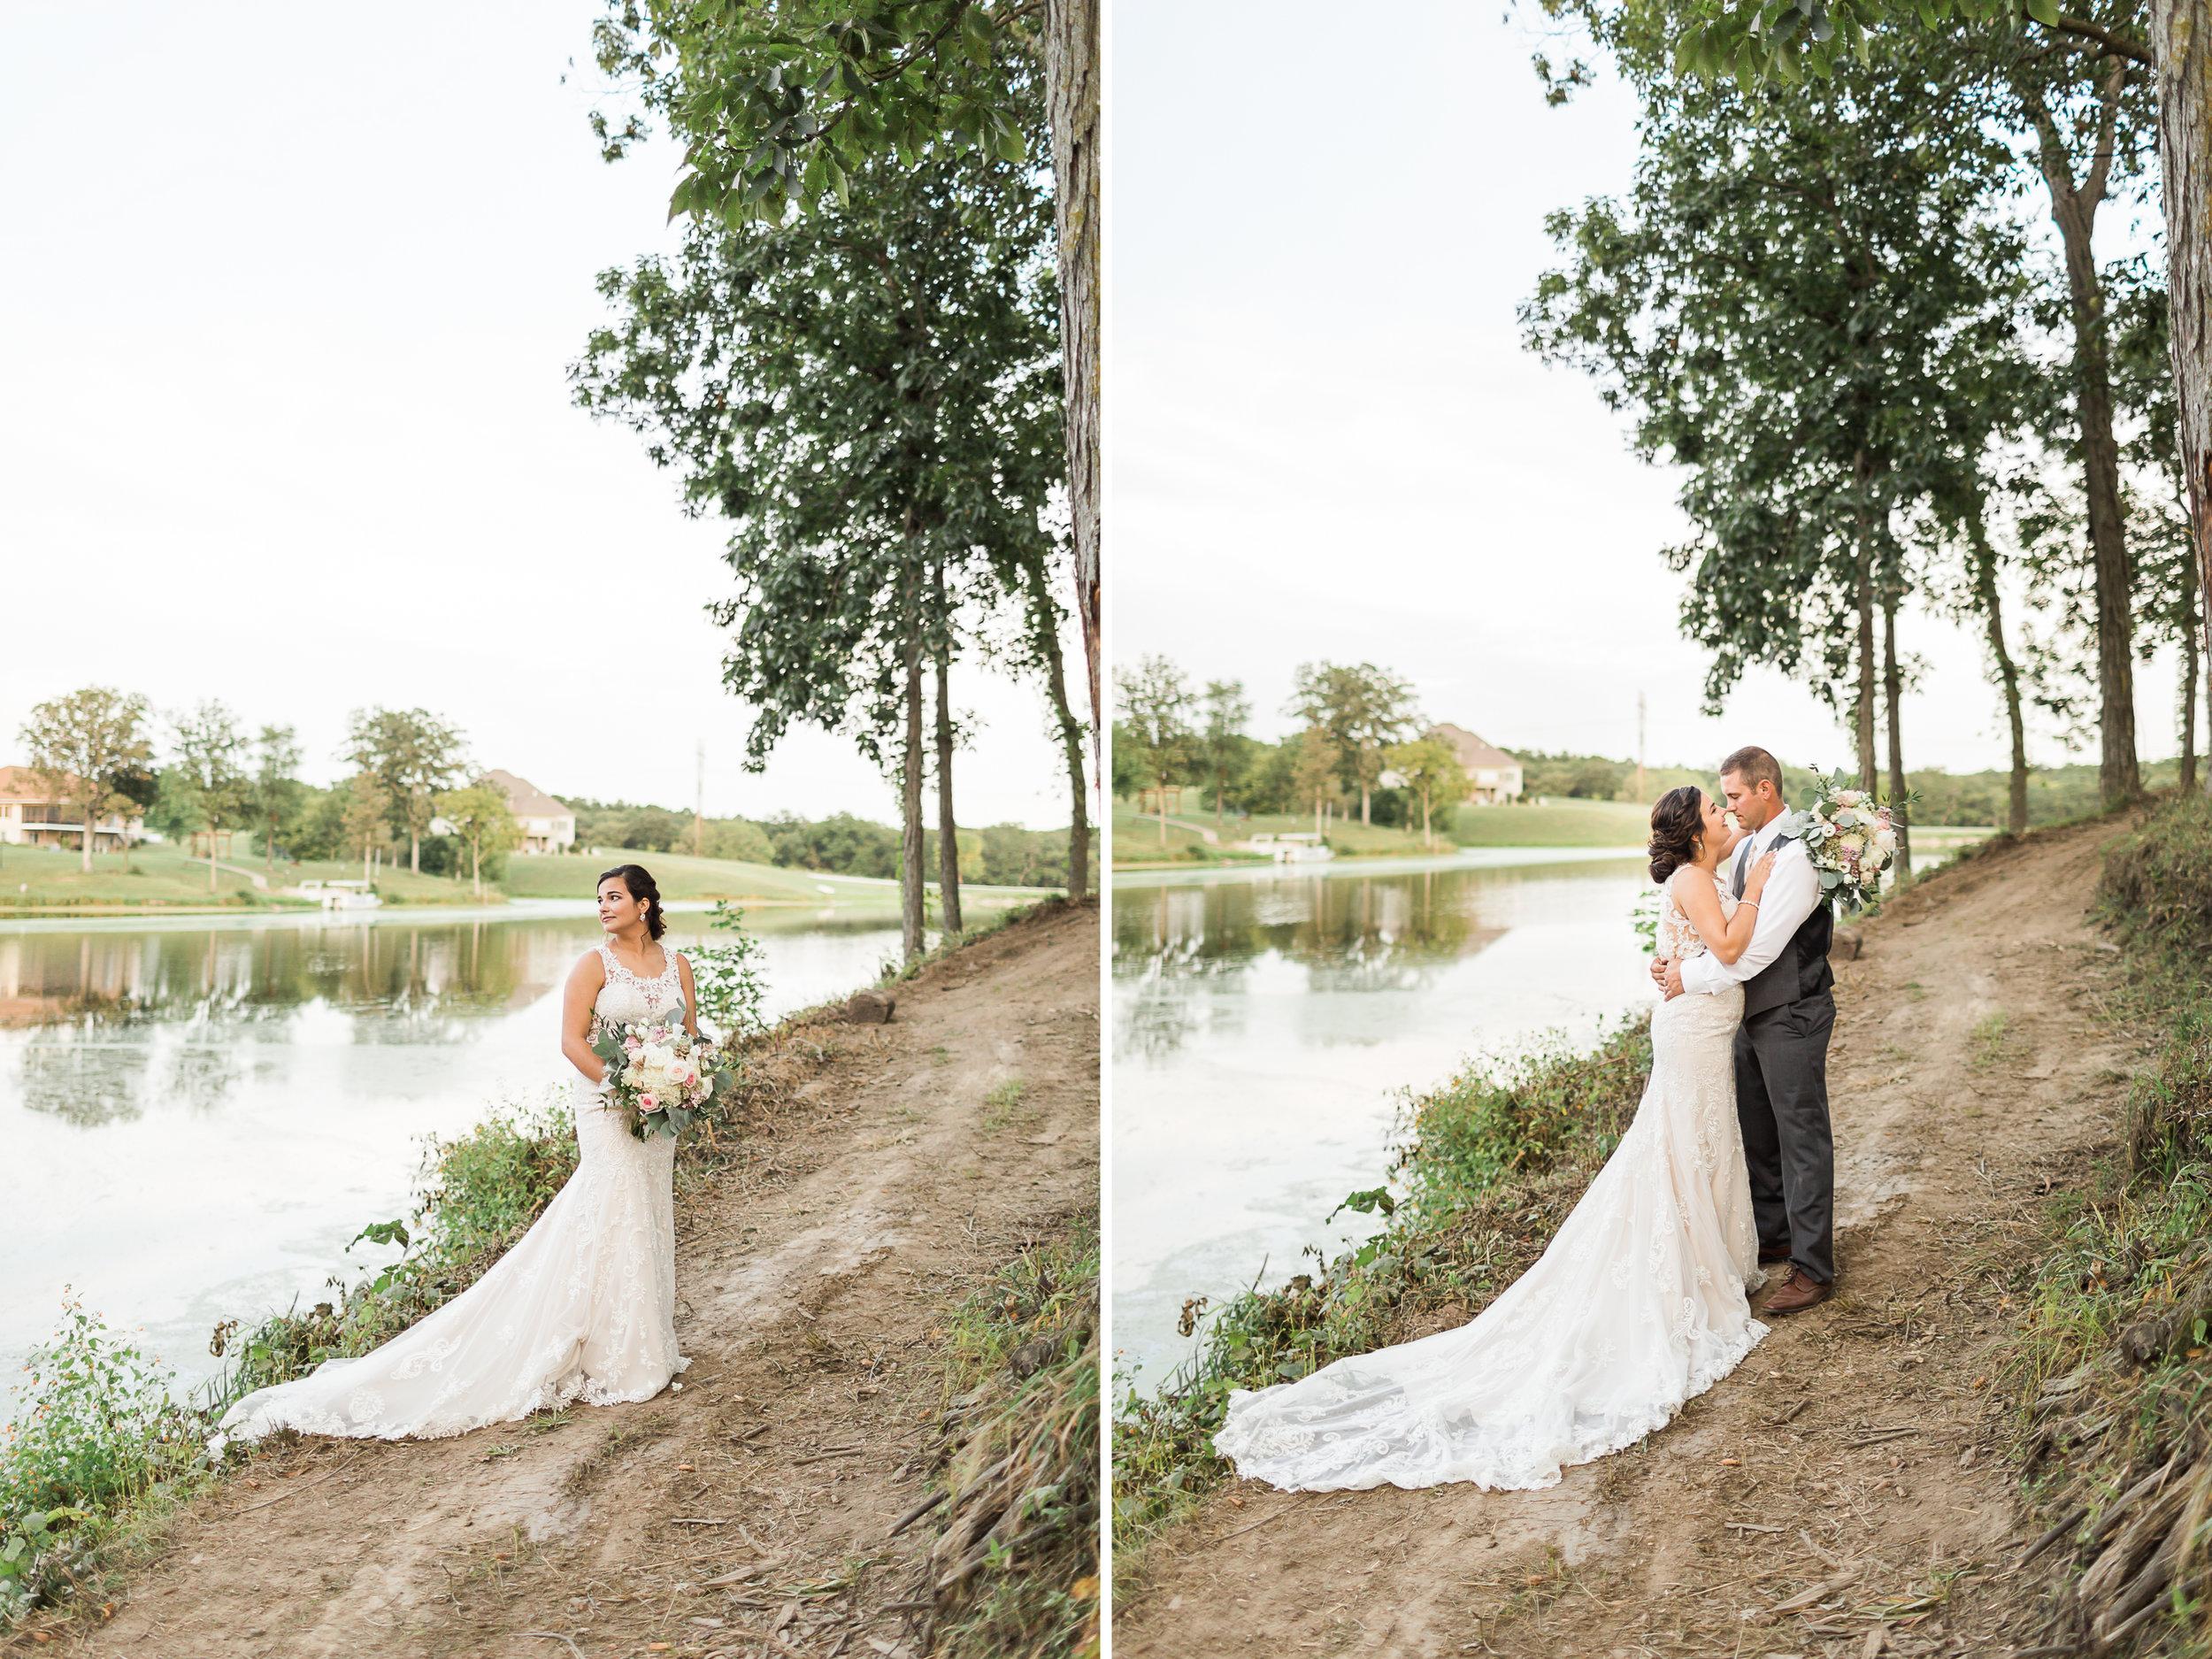 romanticcountrywedding-19.jpg